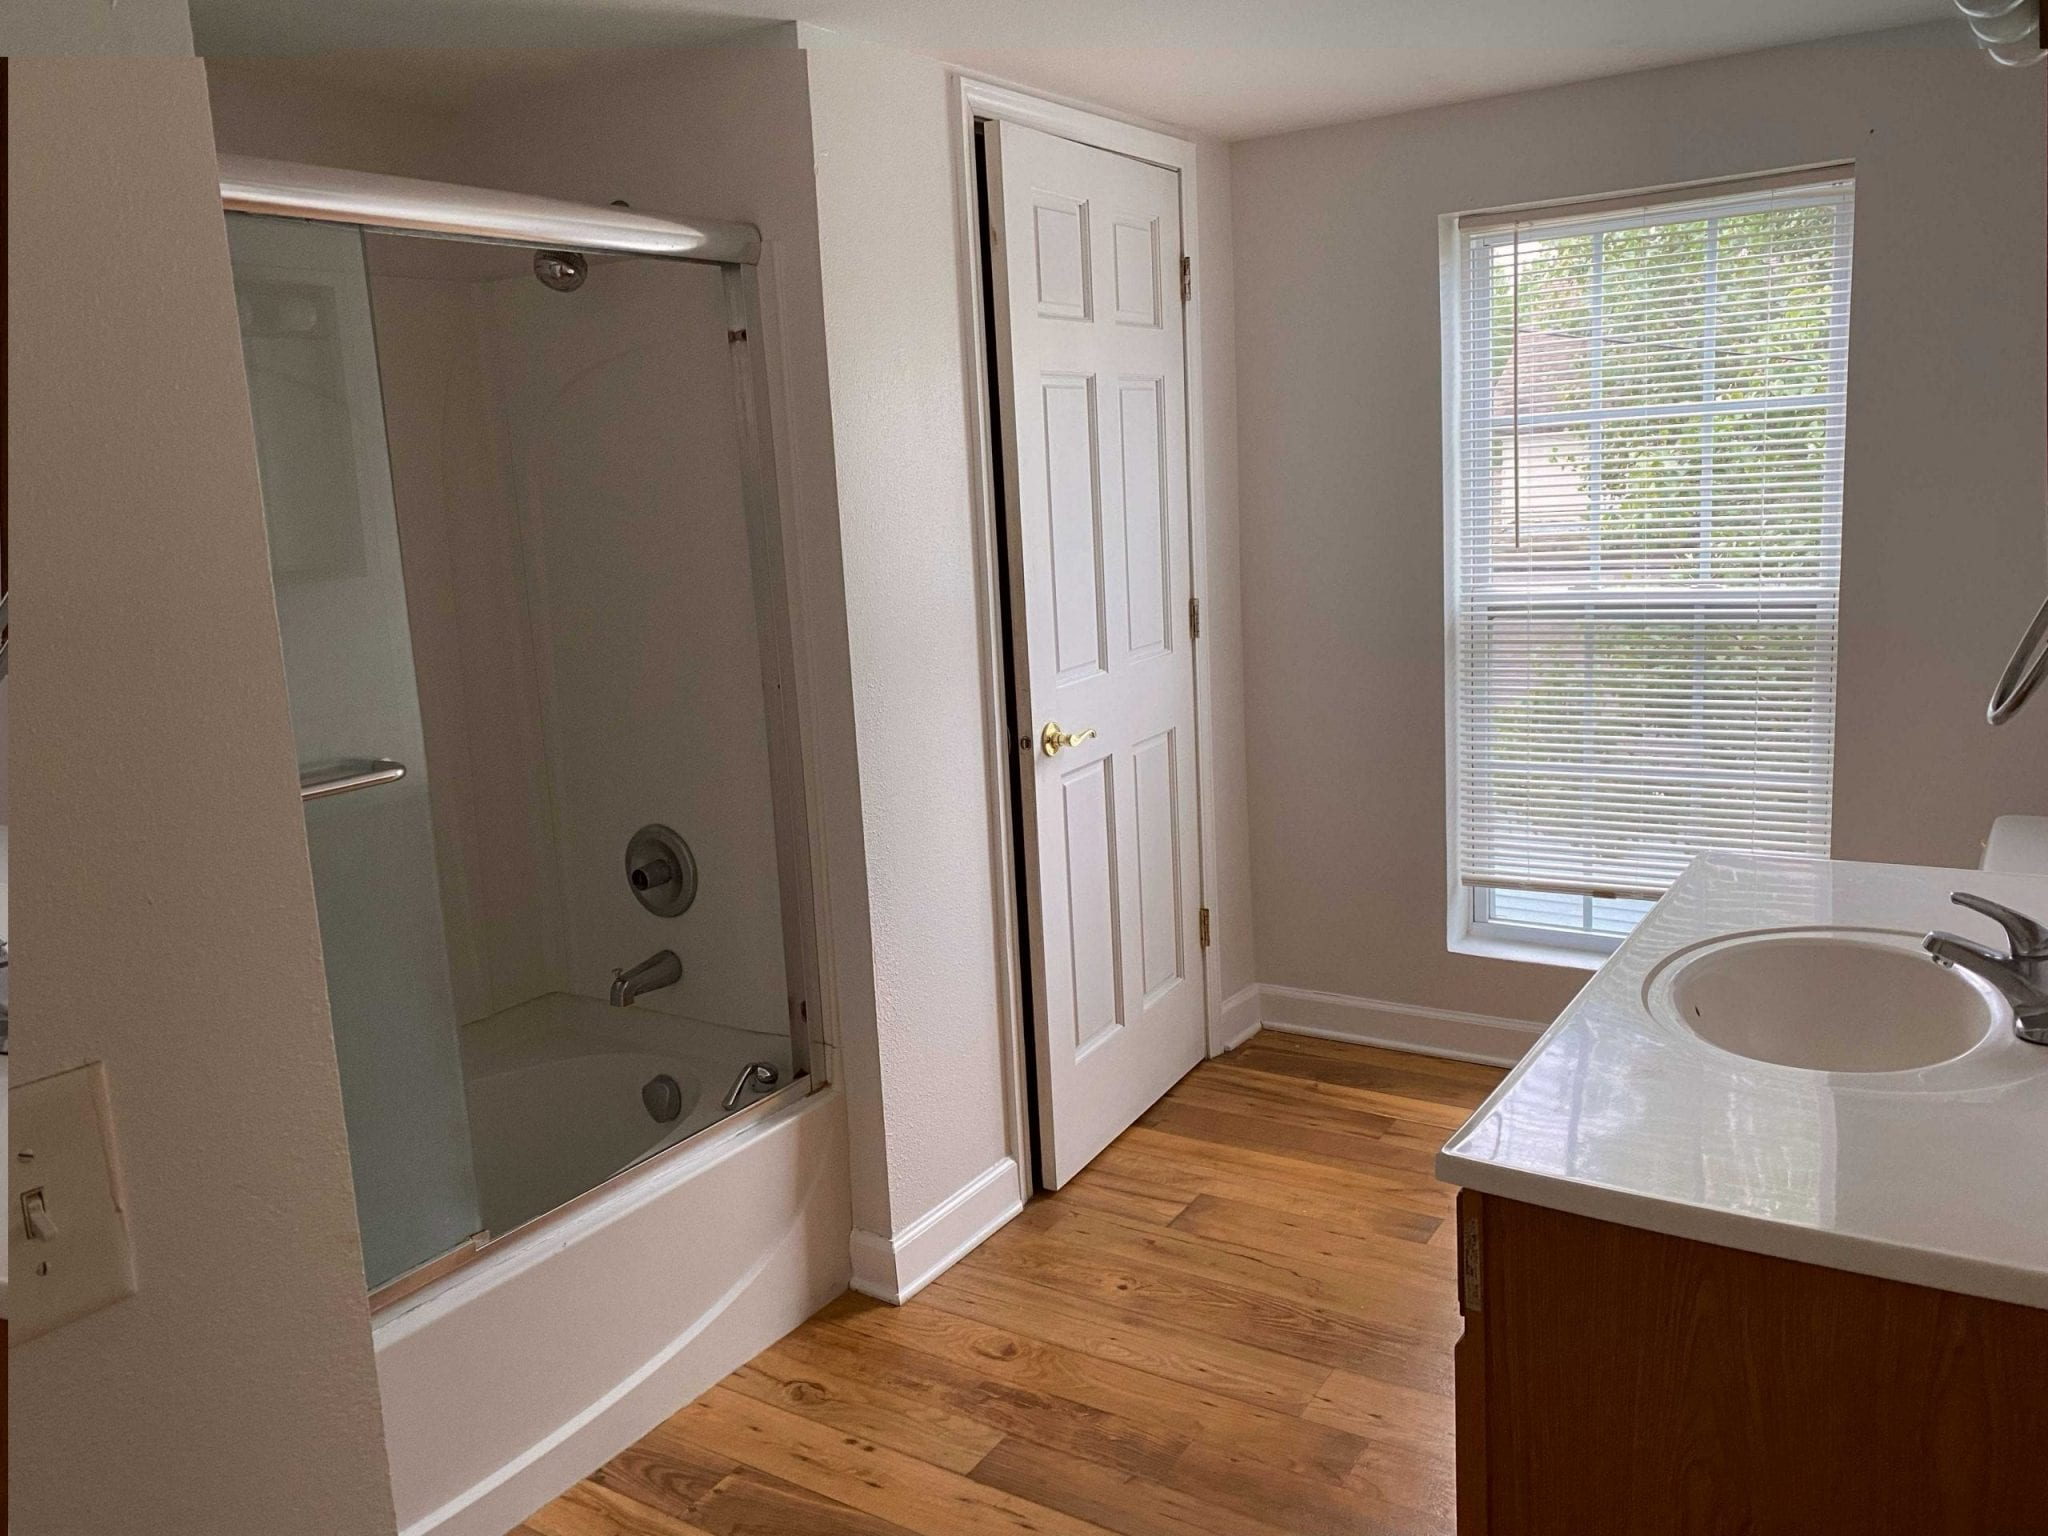 Upstairs Full Bathroom (downstairs has 1/2 bath)